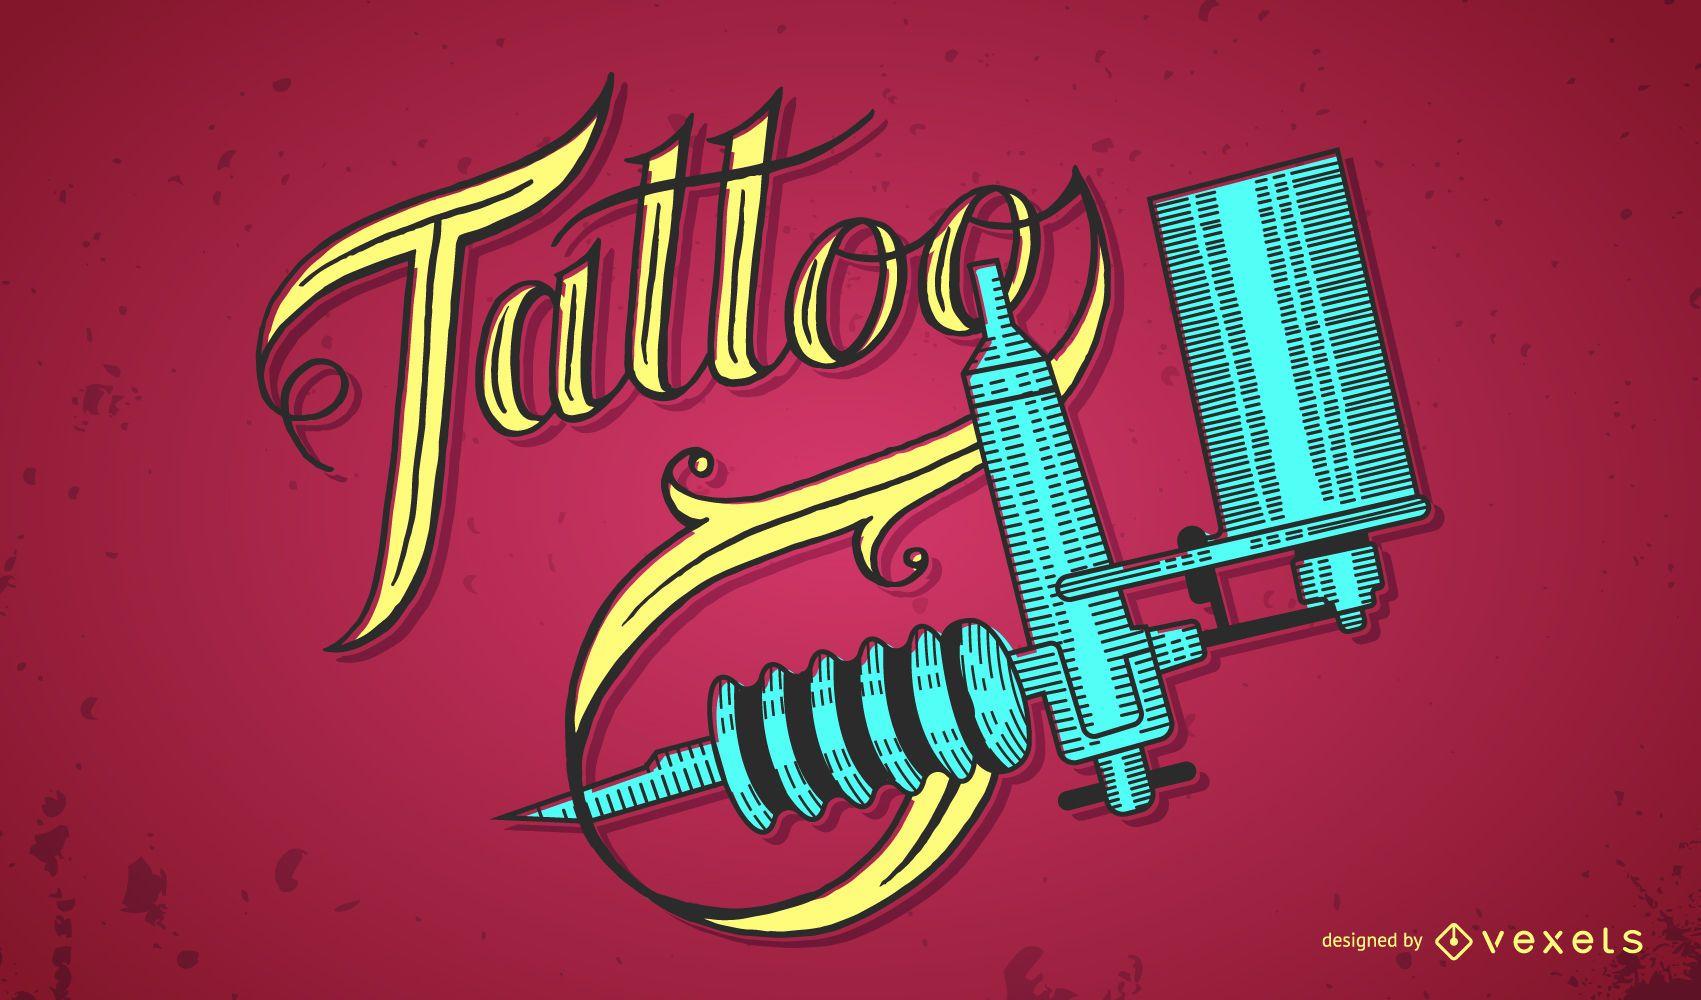 Tattoo lettering and tattoo machine design